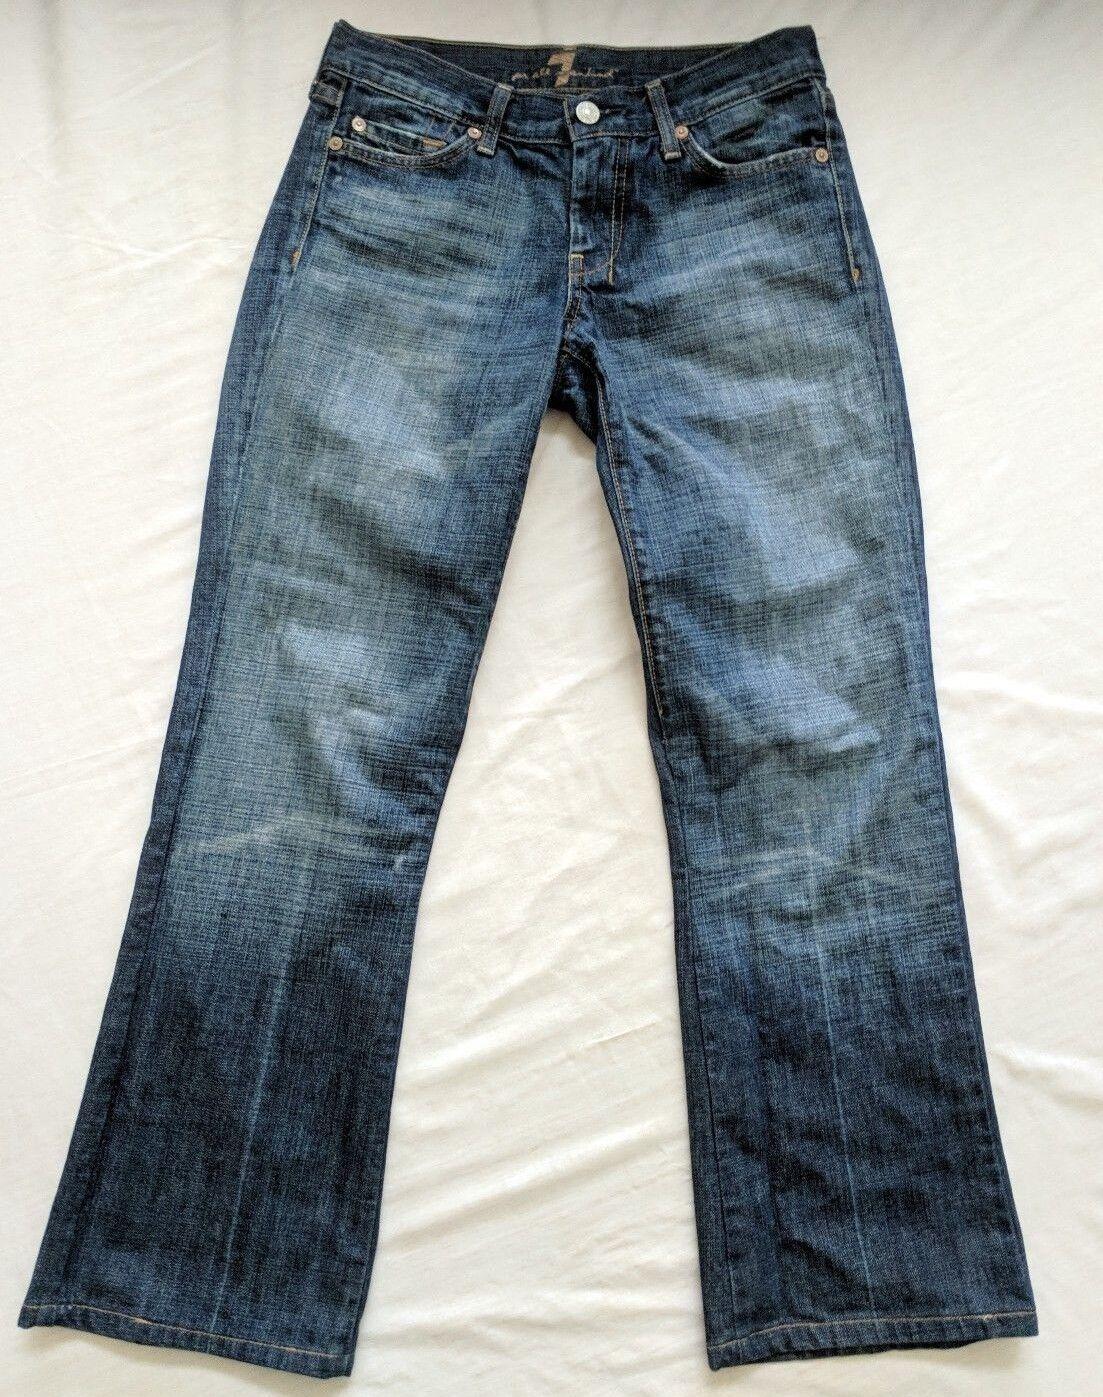 7 For All Mankind Dojo Straight Leg Jeans Medium Wash Size 26 27  Inseam